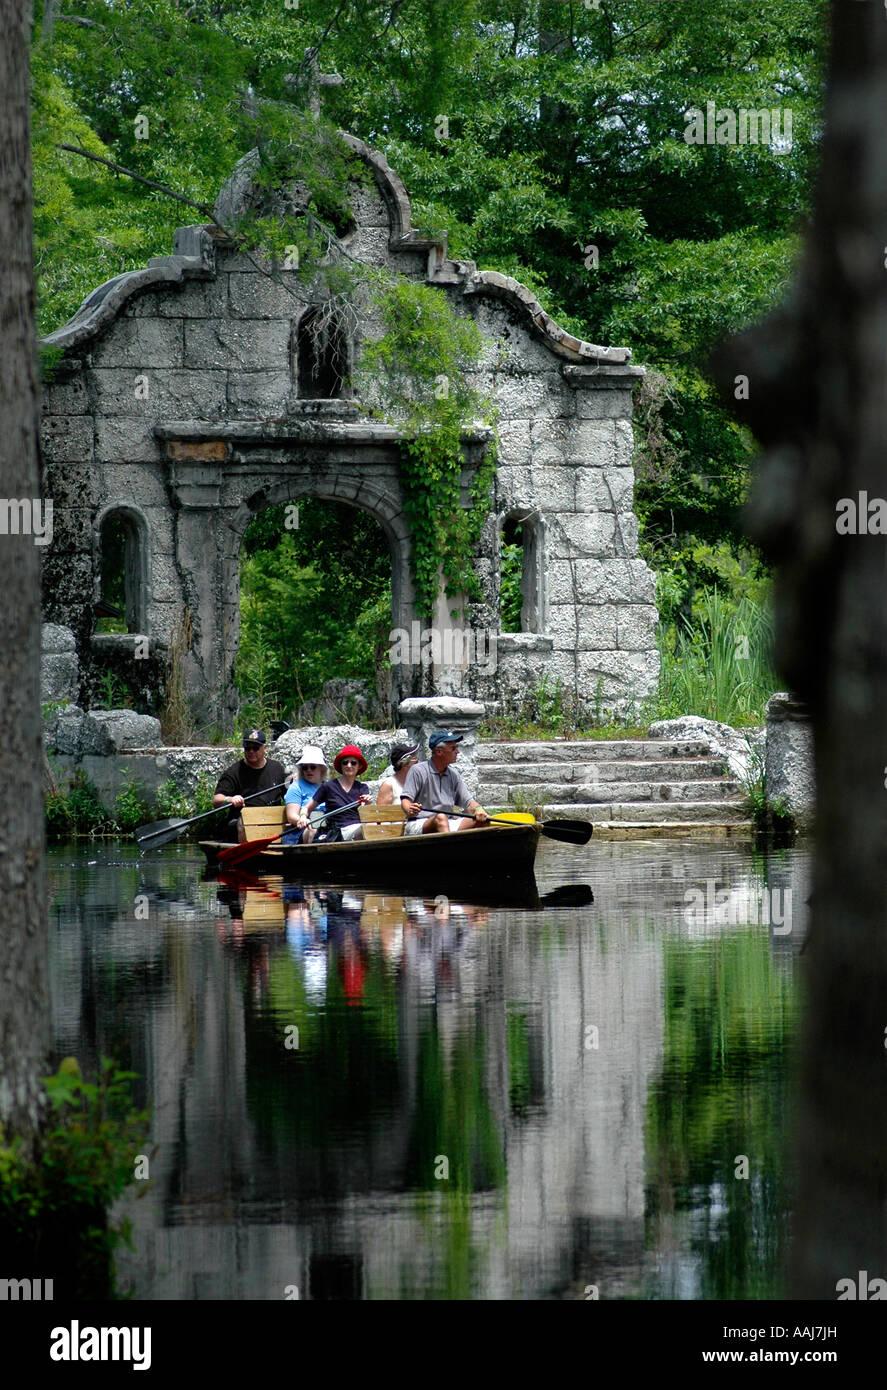 Guided Boat Tours At Cypress Gardens Moncks Corner Sc Stock Photo Royalty Free Image 12640648